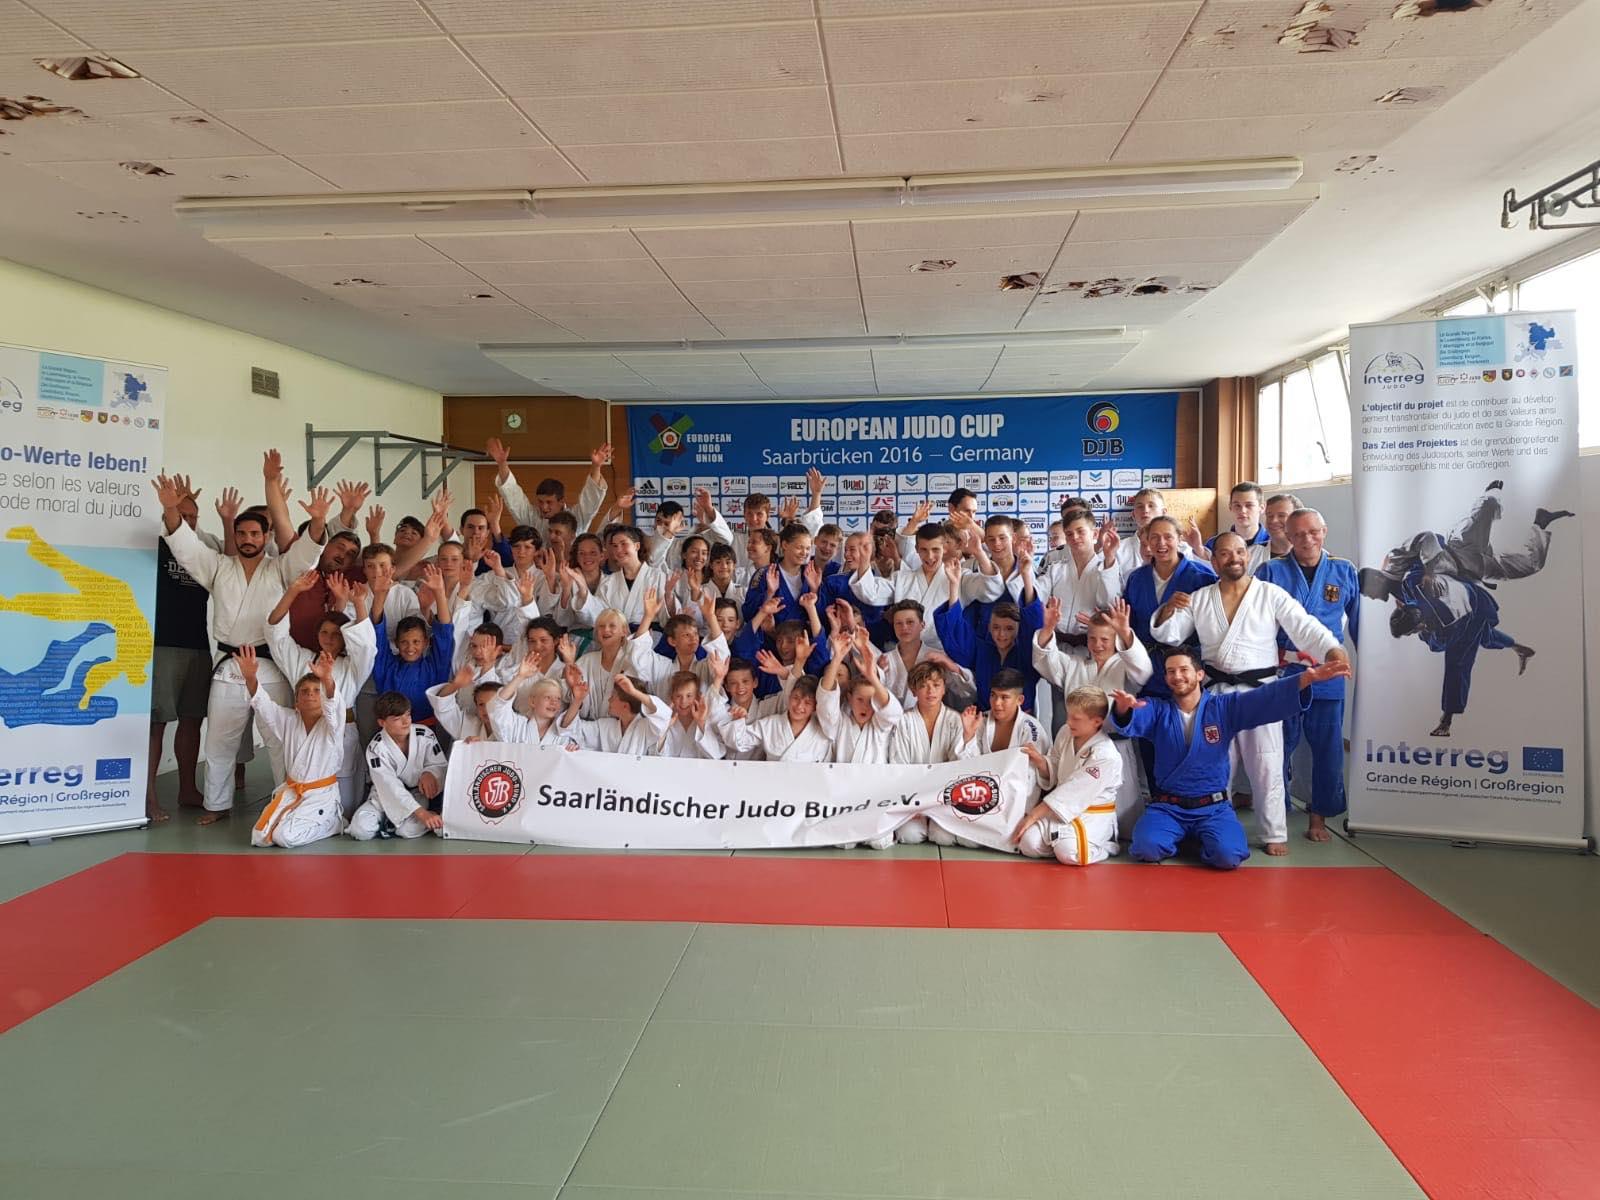 Interreg Judo Training - 09.-11.08.2019 Saarbrücken